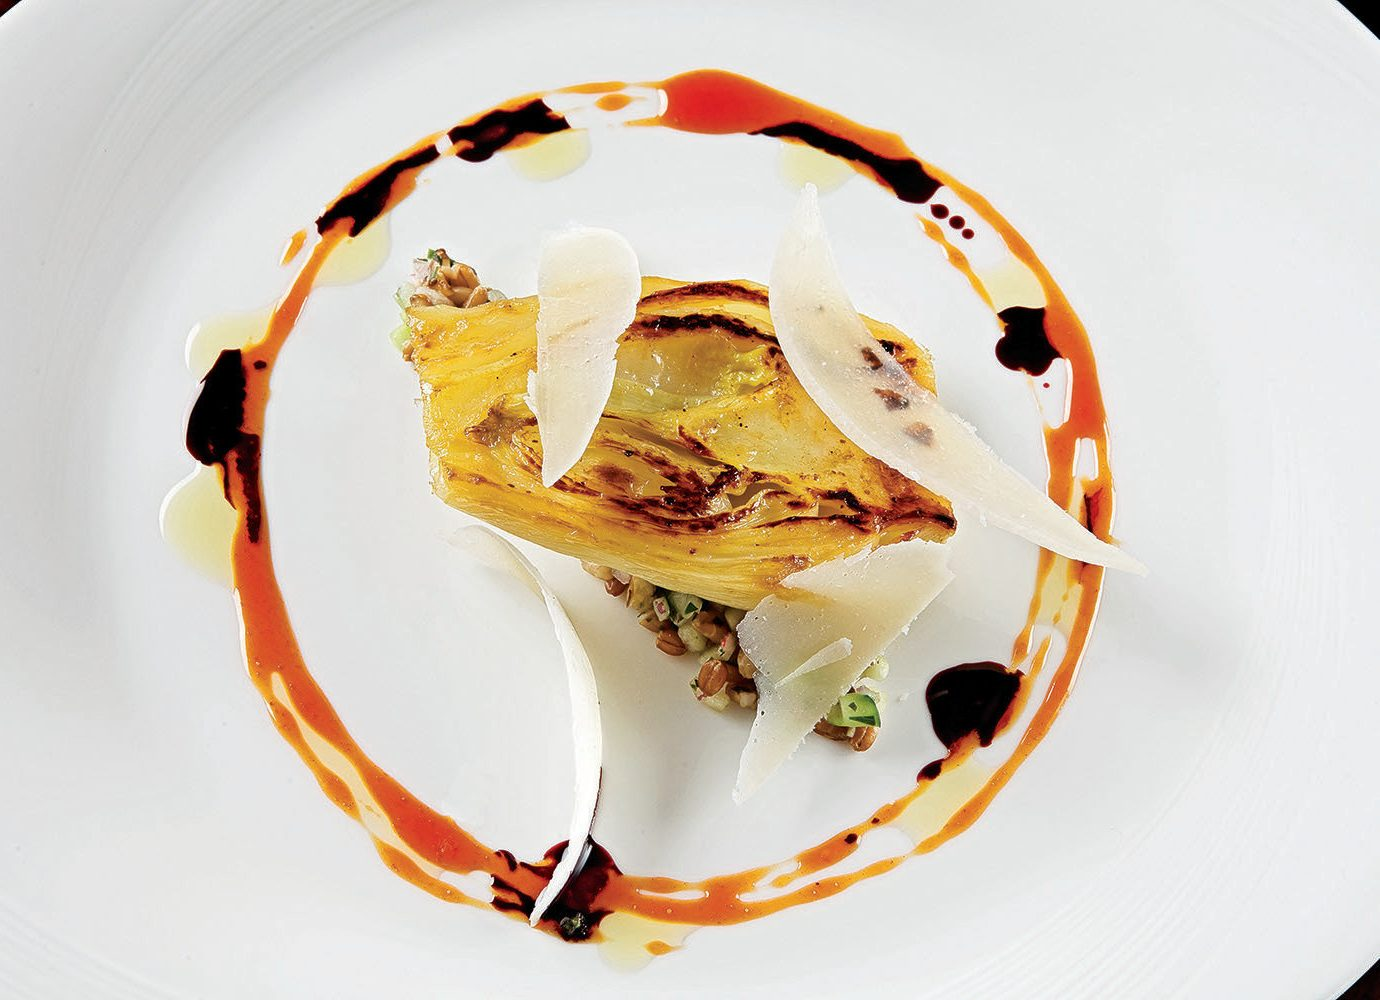 Jetsetter Guides plate food white piece jewellery produce dish fashion accessory slice flower dessert dishware